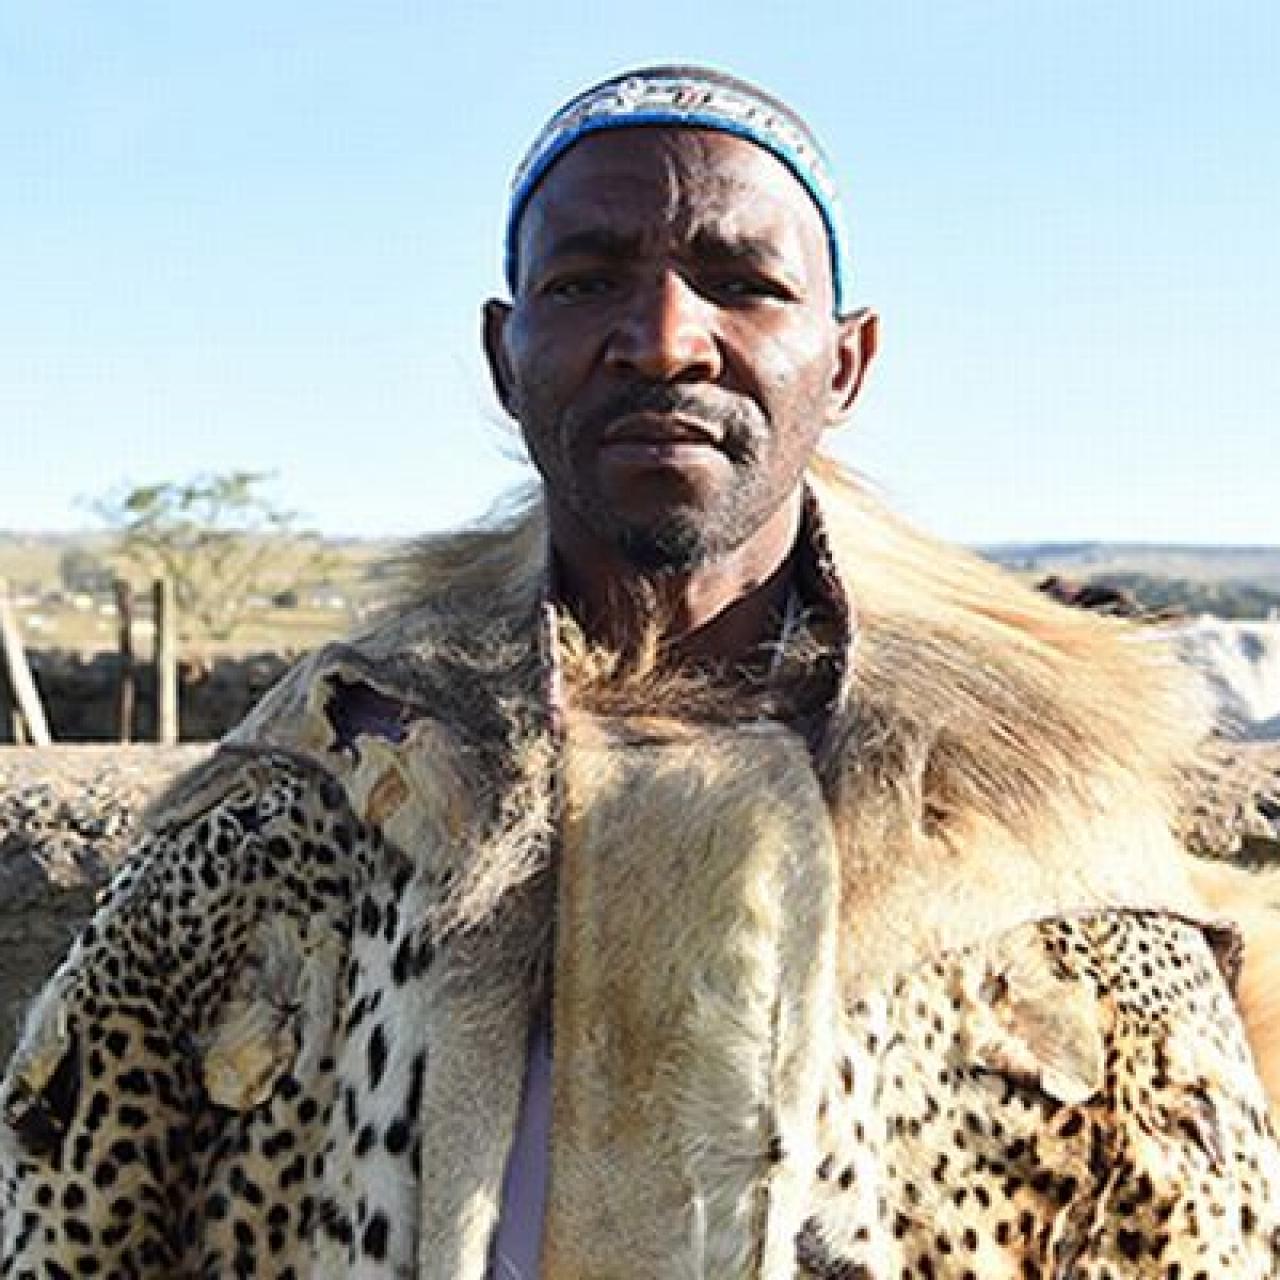 Xhosa King Mpendulo Zwelonke Sigcawu